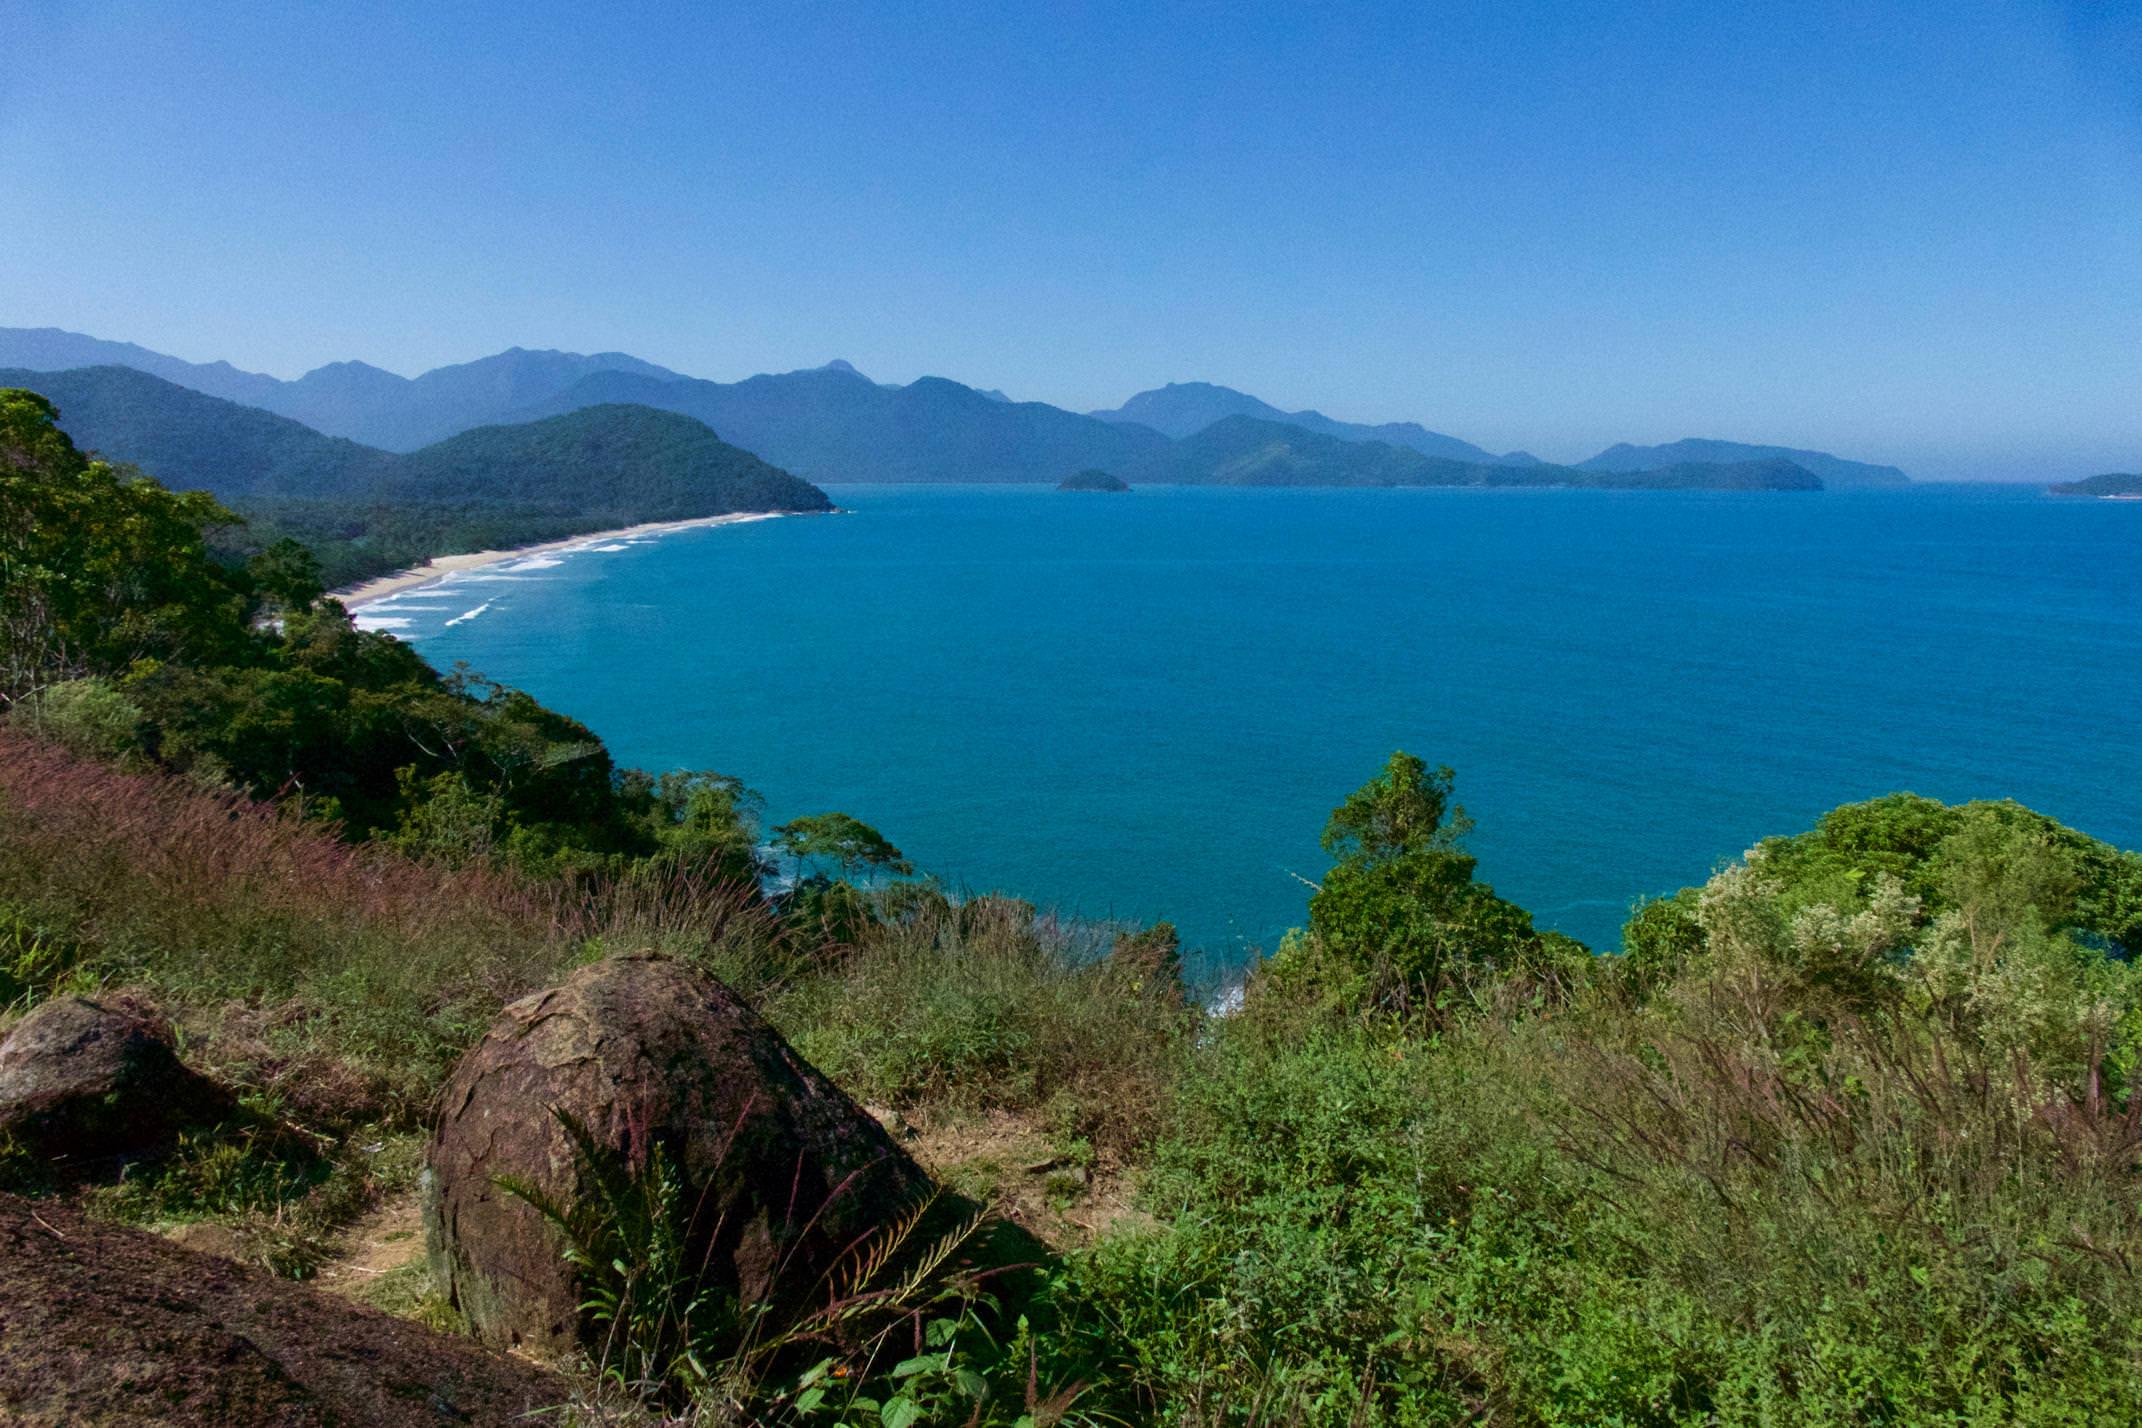 Brazil paraty views of costa verde from ubatuba copyright pura aventura thomas power